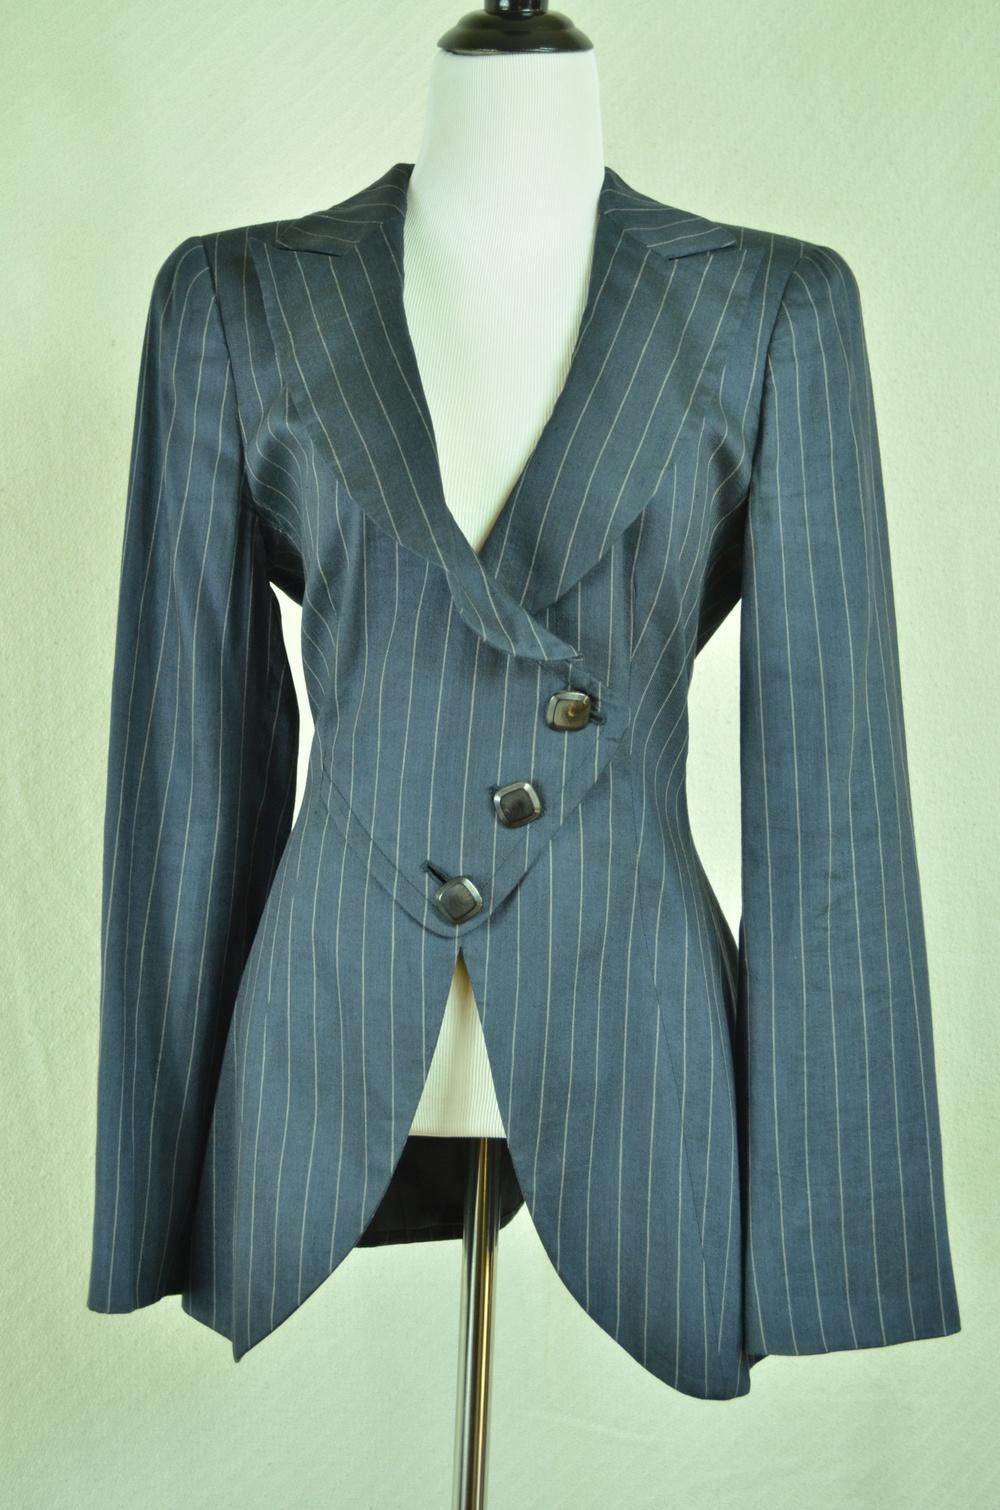 44. Giorgio Armani Linen Jacket